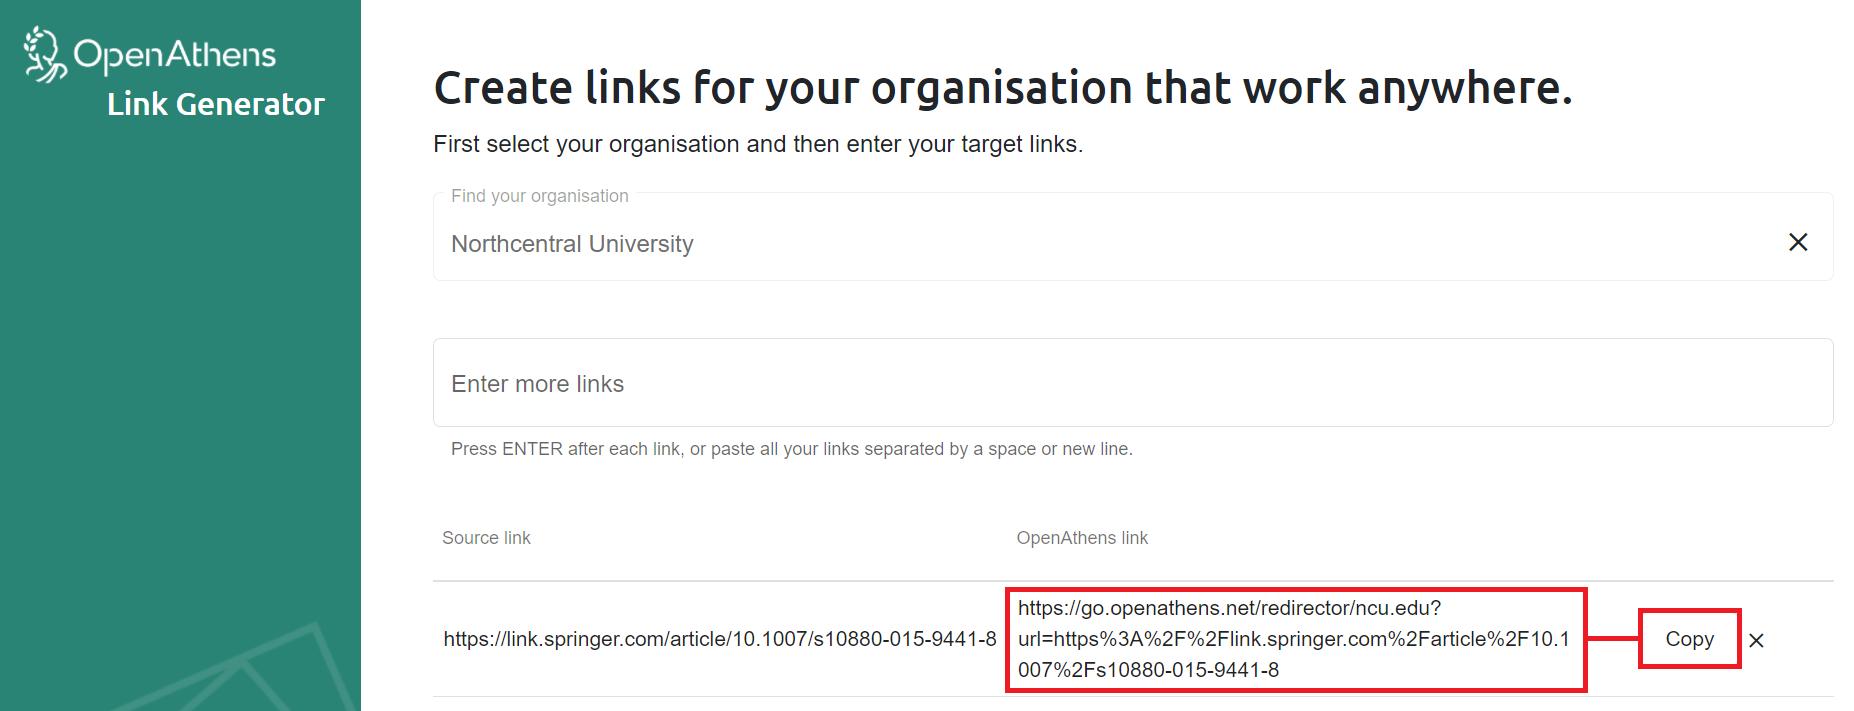 OpenAthens redirector link generator creating a resource link for a SpringerLink resource